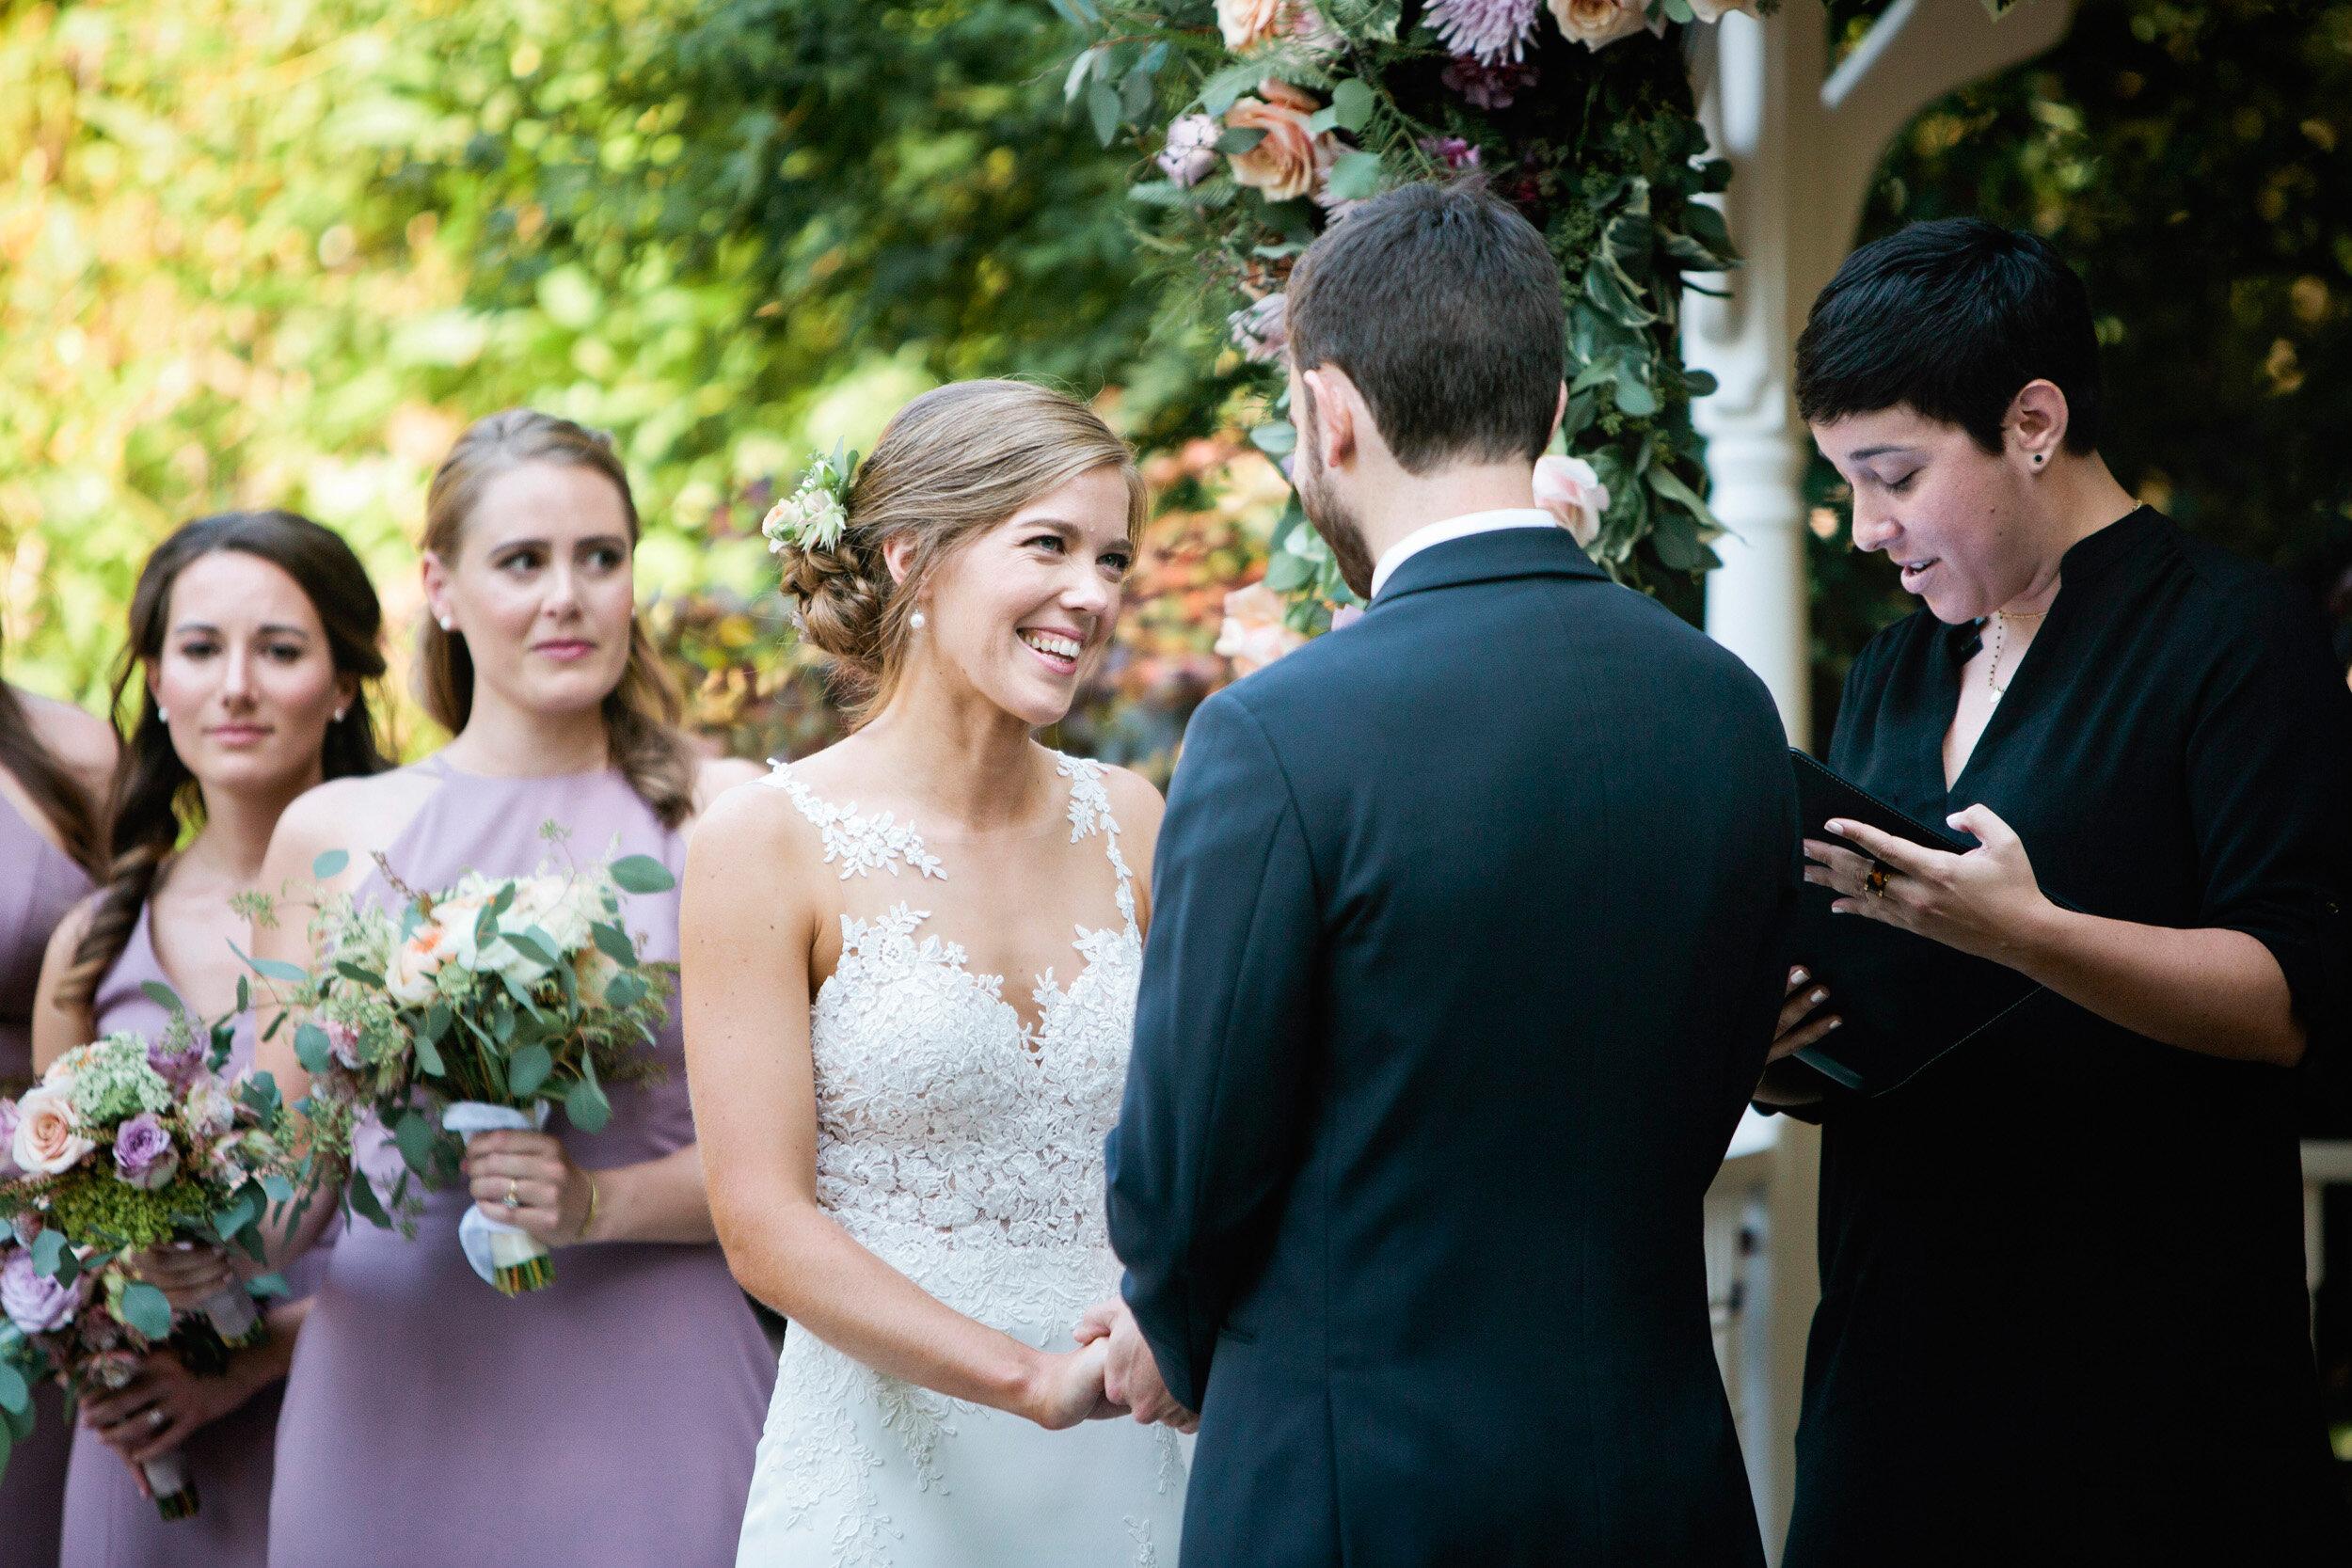 Marin-Art-Garden-Center-Wedding-33.JPG